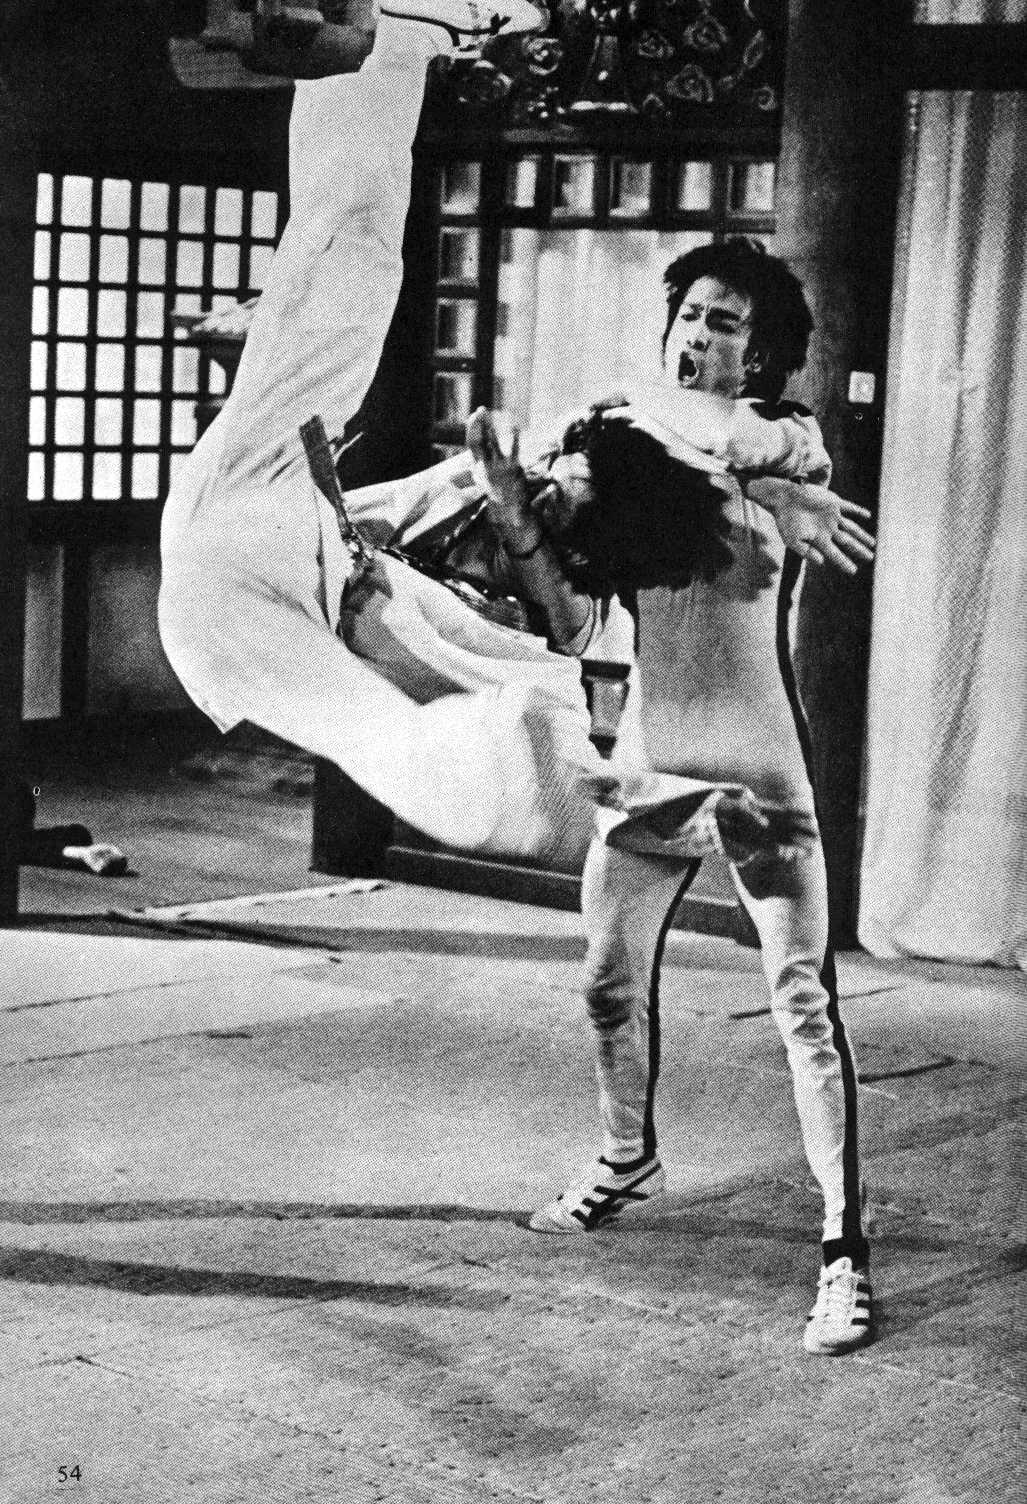 Bruce Lees Game of Death 1978 Si Wang You Ju 1978 Goodbye Bruce Lee His Last Game Of Death  Billys Funeral Dirge Game of Death 5 Garden Fight Game of Death  6